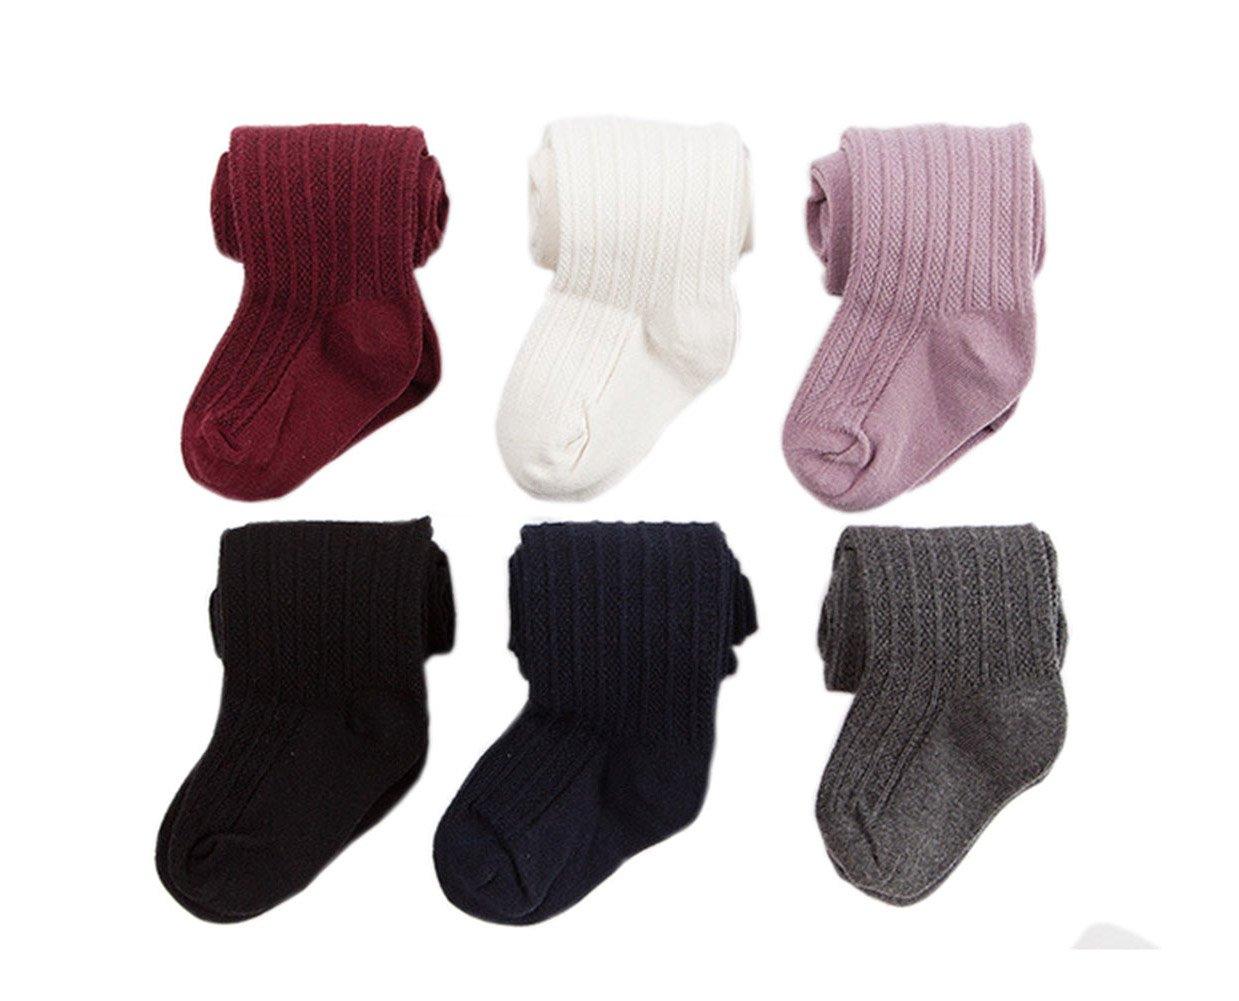 Taiycyxgan Baby Kid Girls Winter Tights Cable Knit Tights 6 Pack Leggings Stocking Pants 6-12M by TAIYCYXGAN